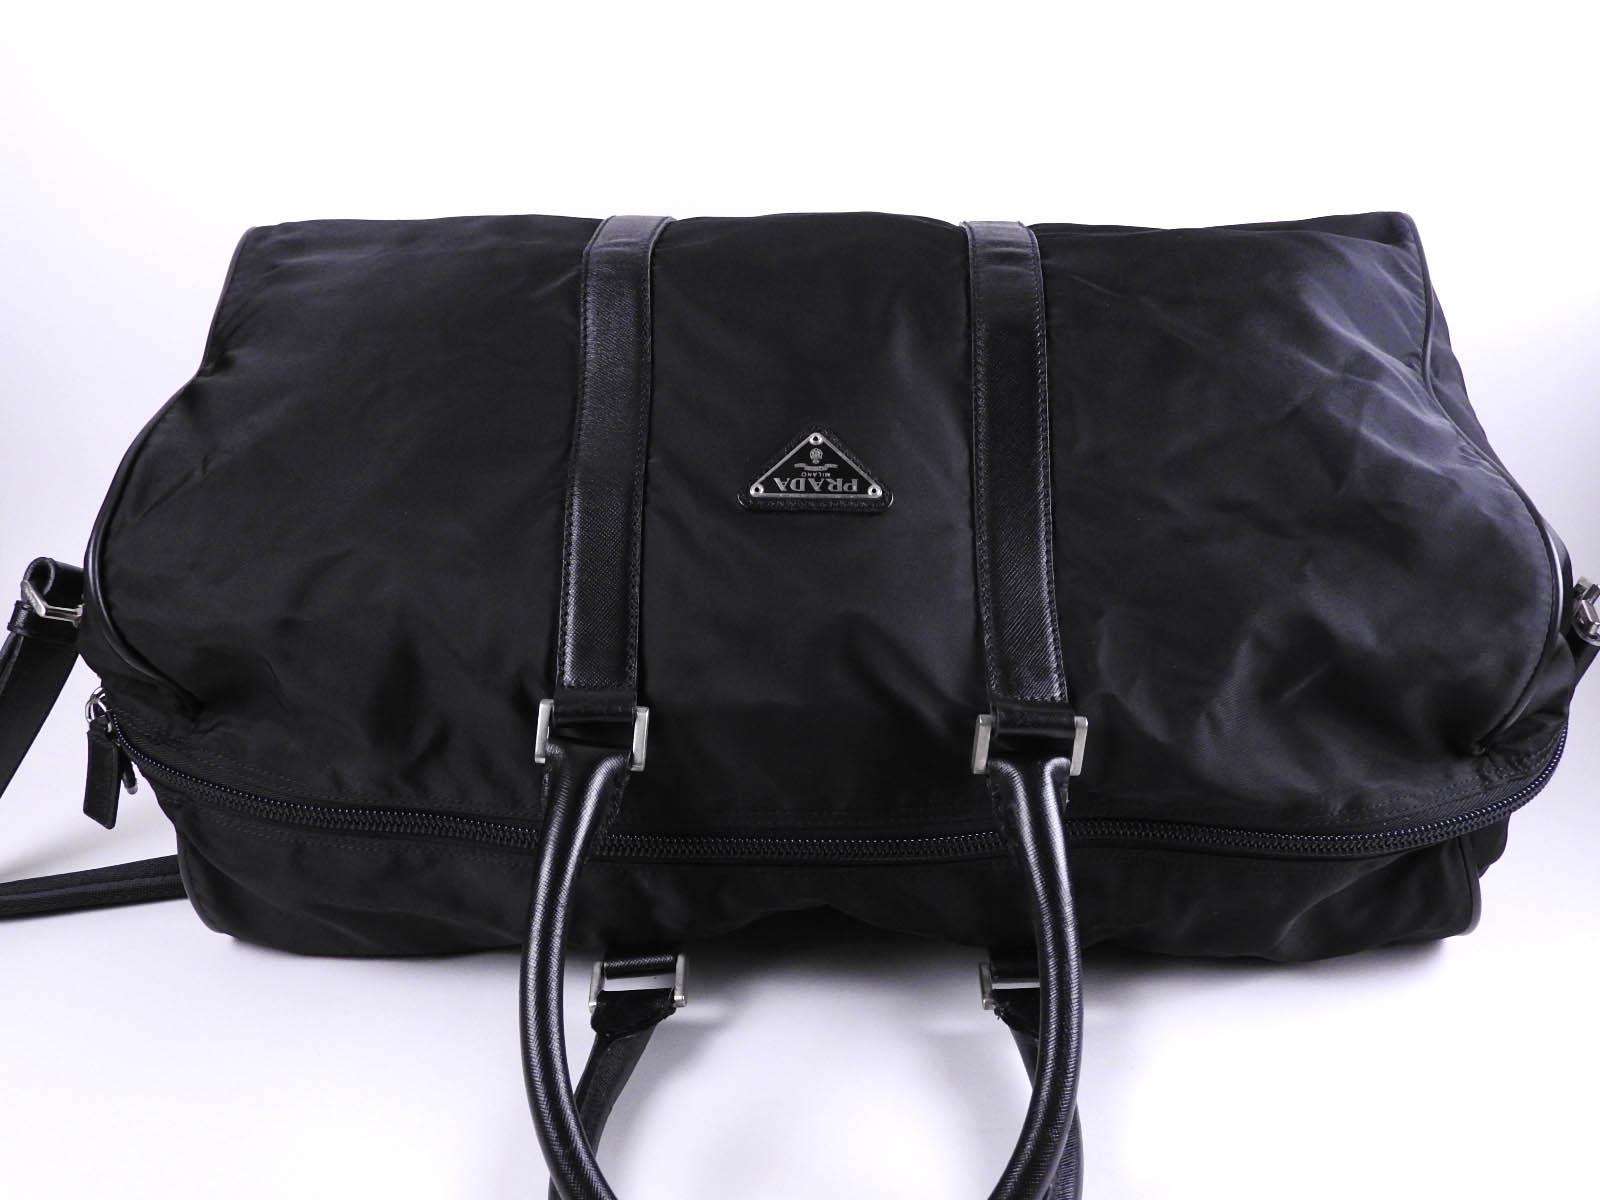 84a12351e8d2 Auth PRADA Tessuto Nylon 2way Travel Boston Bag Saffiano Leather ...